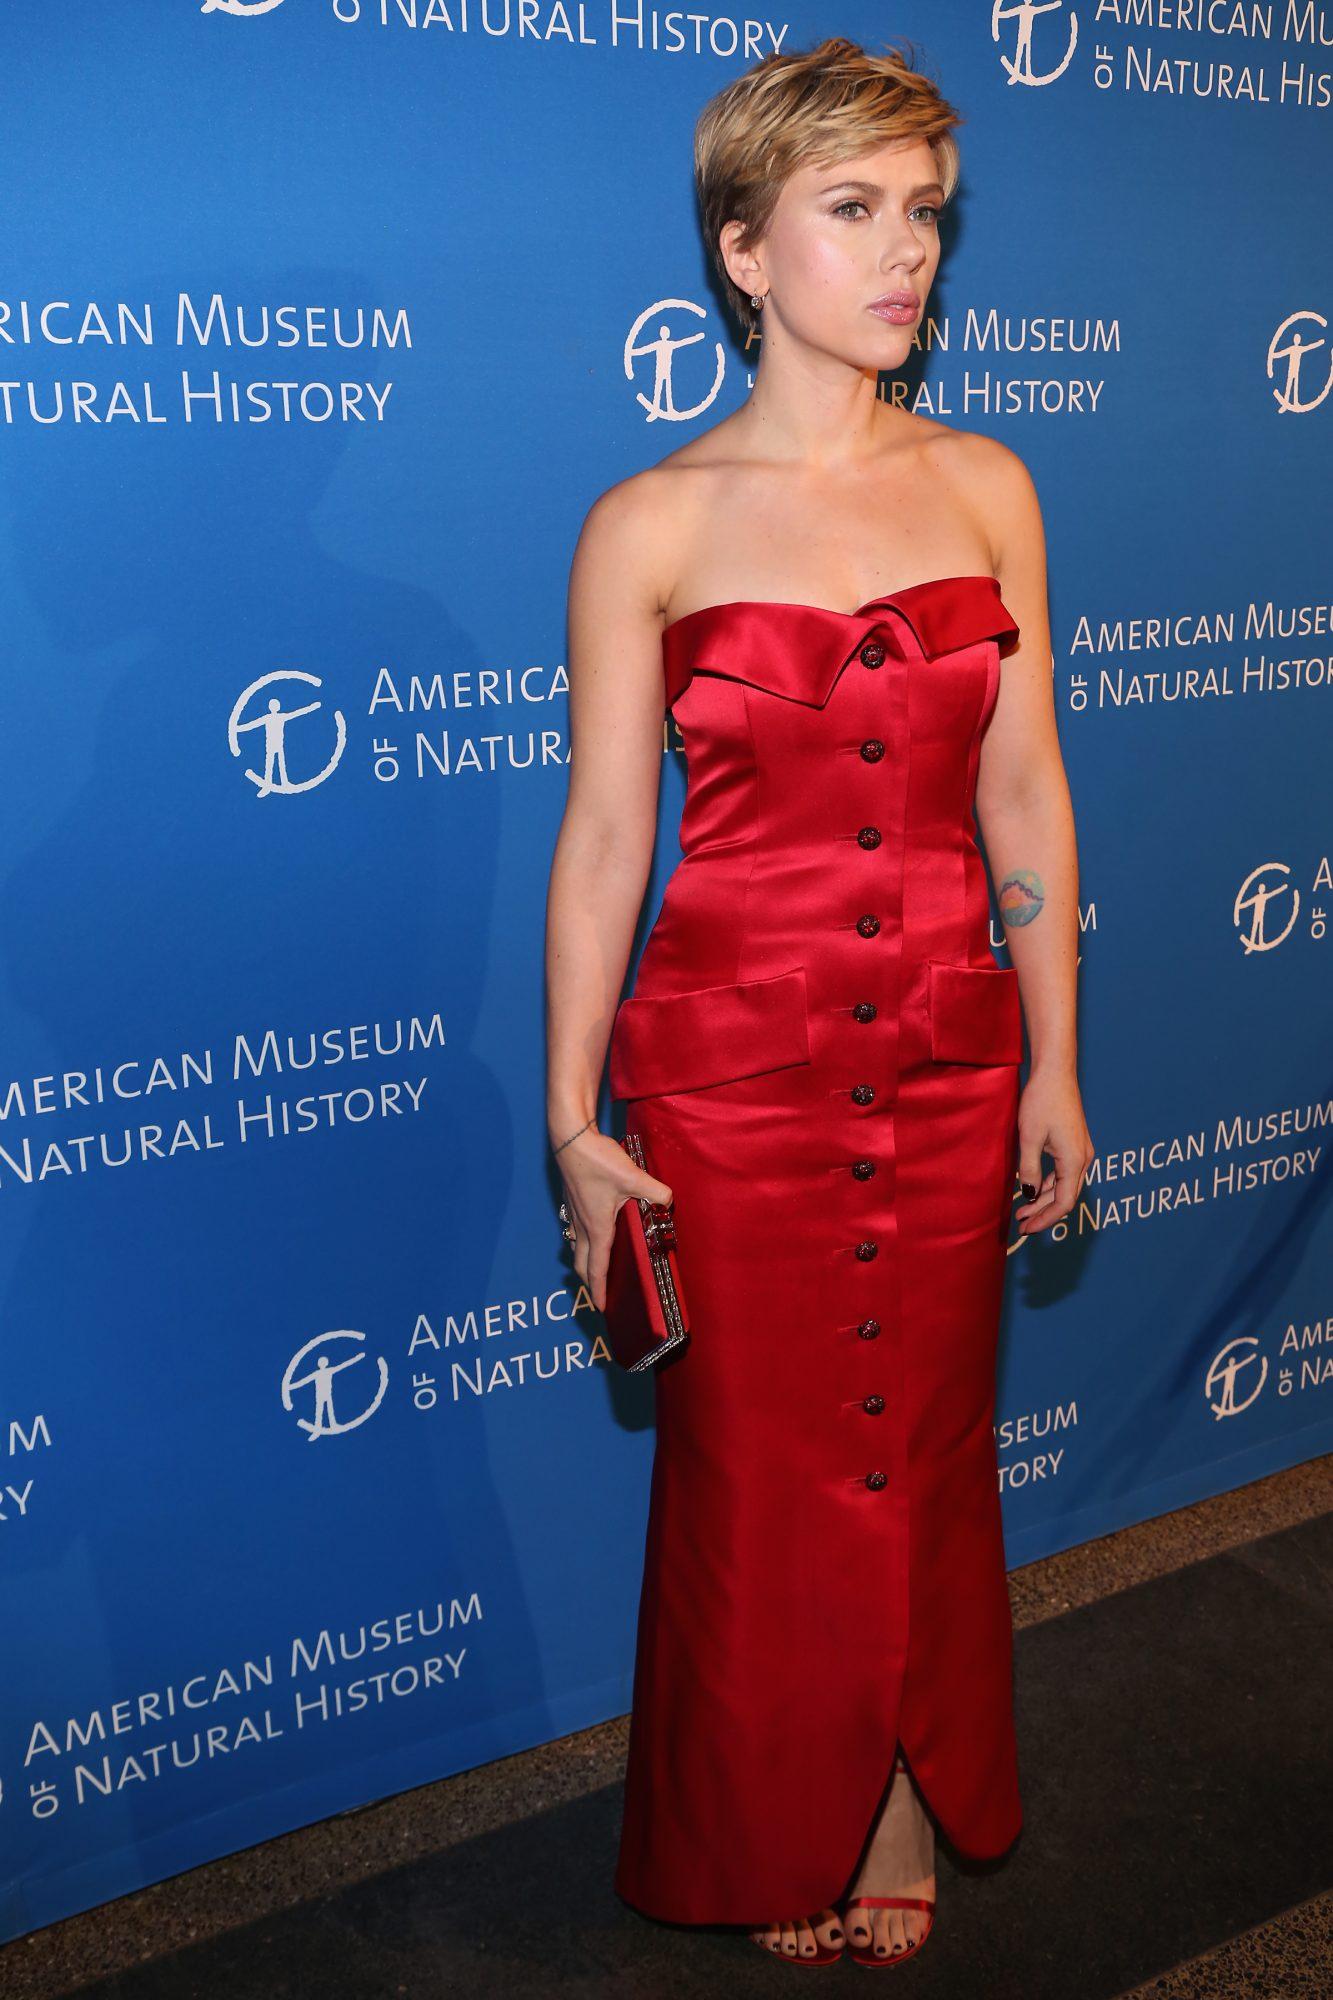 Scarkett-Johannson-red-dress.jpg